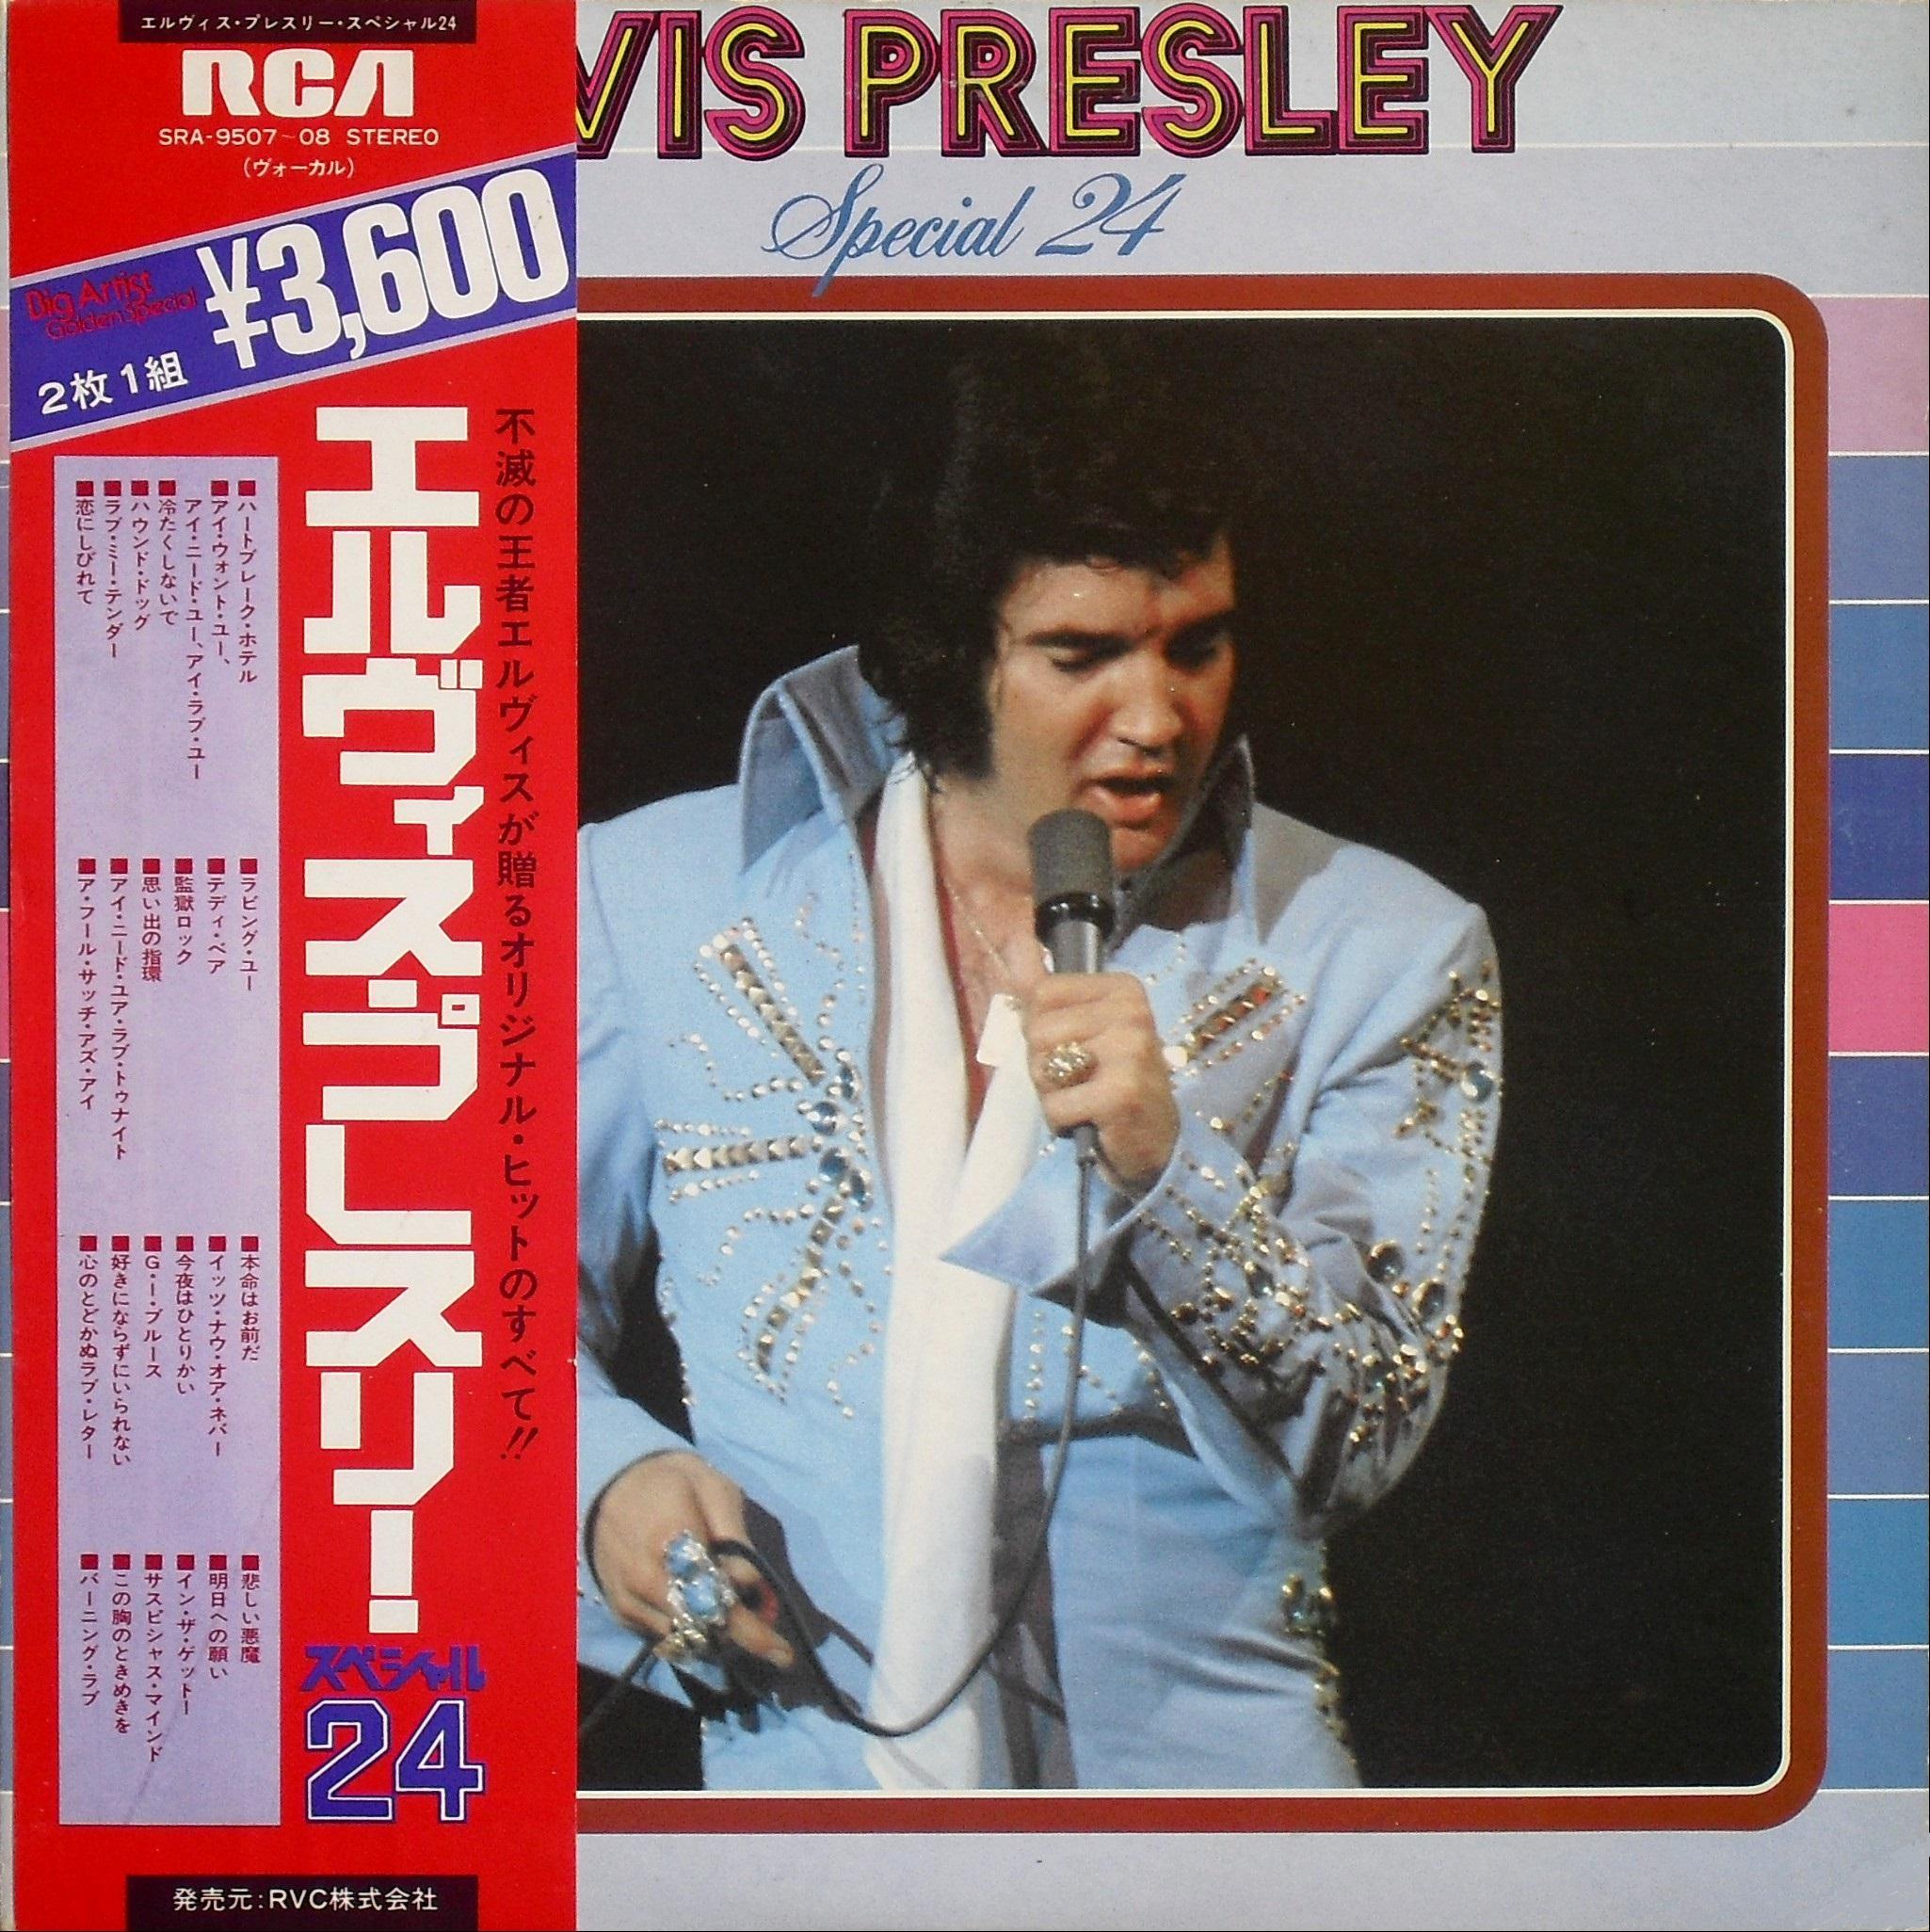 Diskografie Japan 1955 - 1977 Sra-9507docux